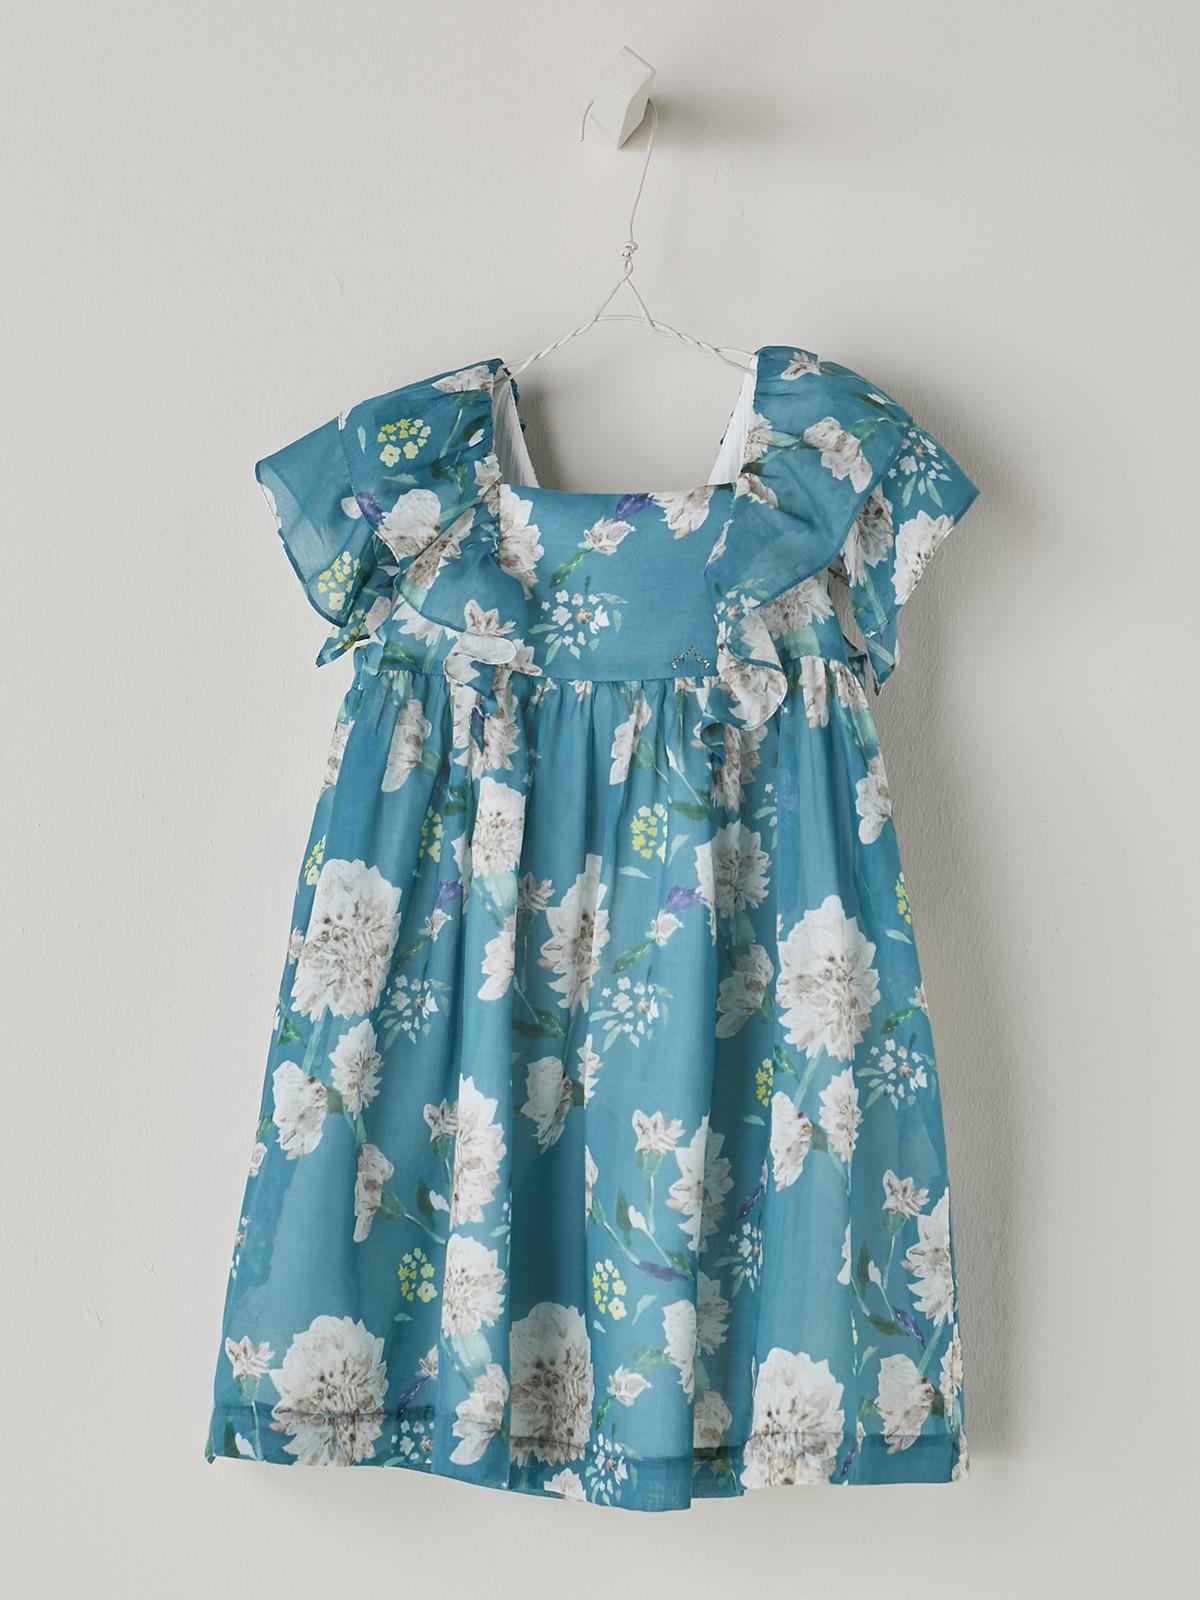 NANOS 藍色花朵洋裝